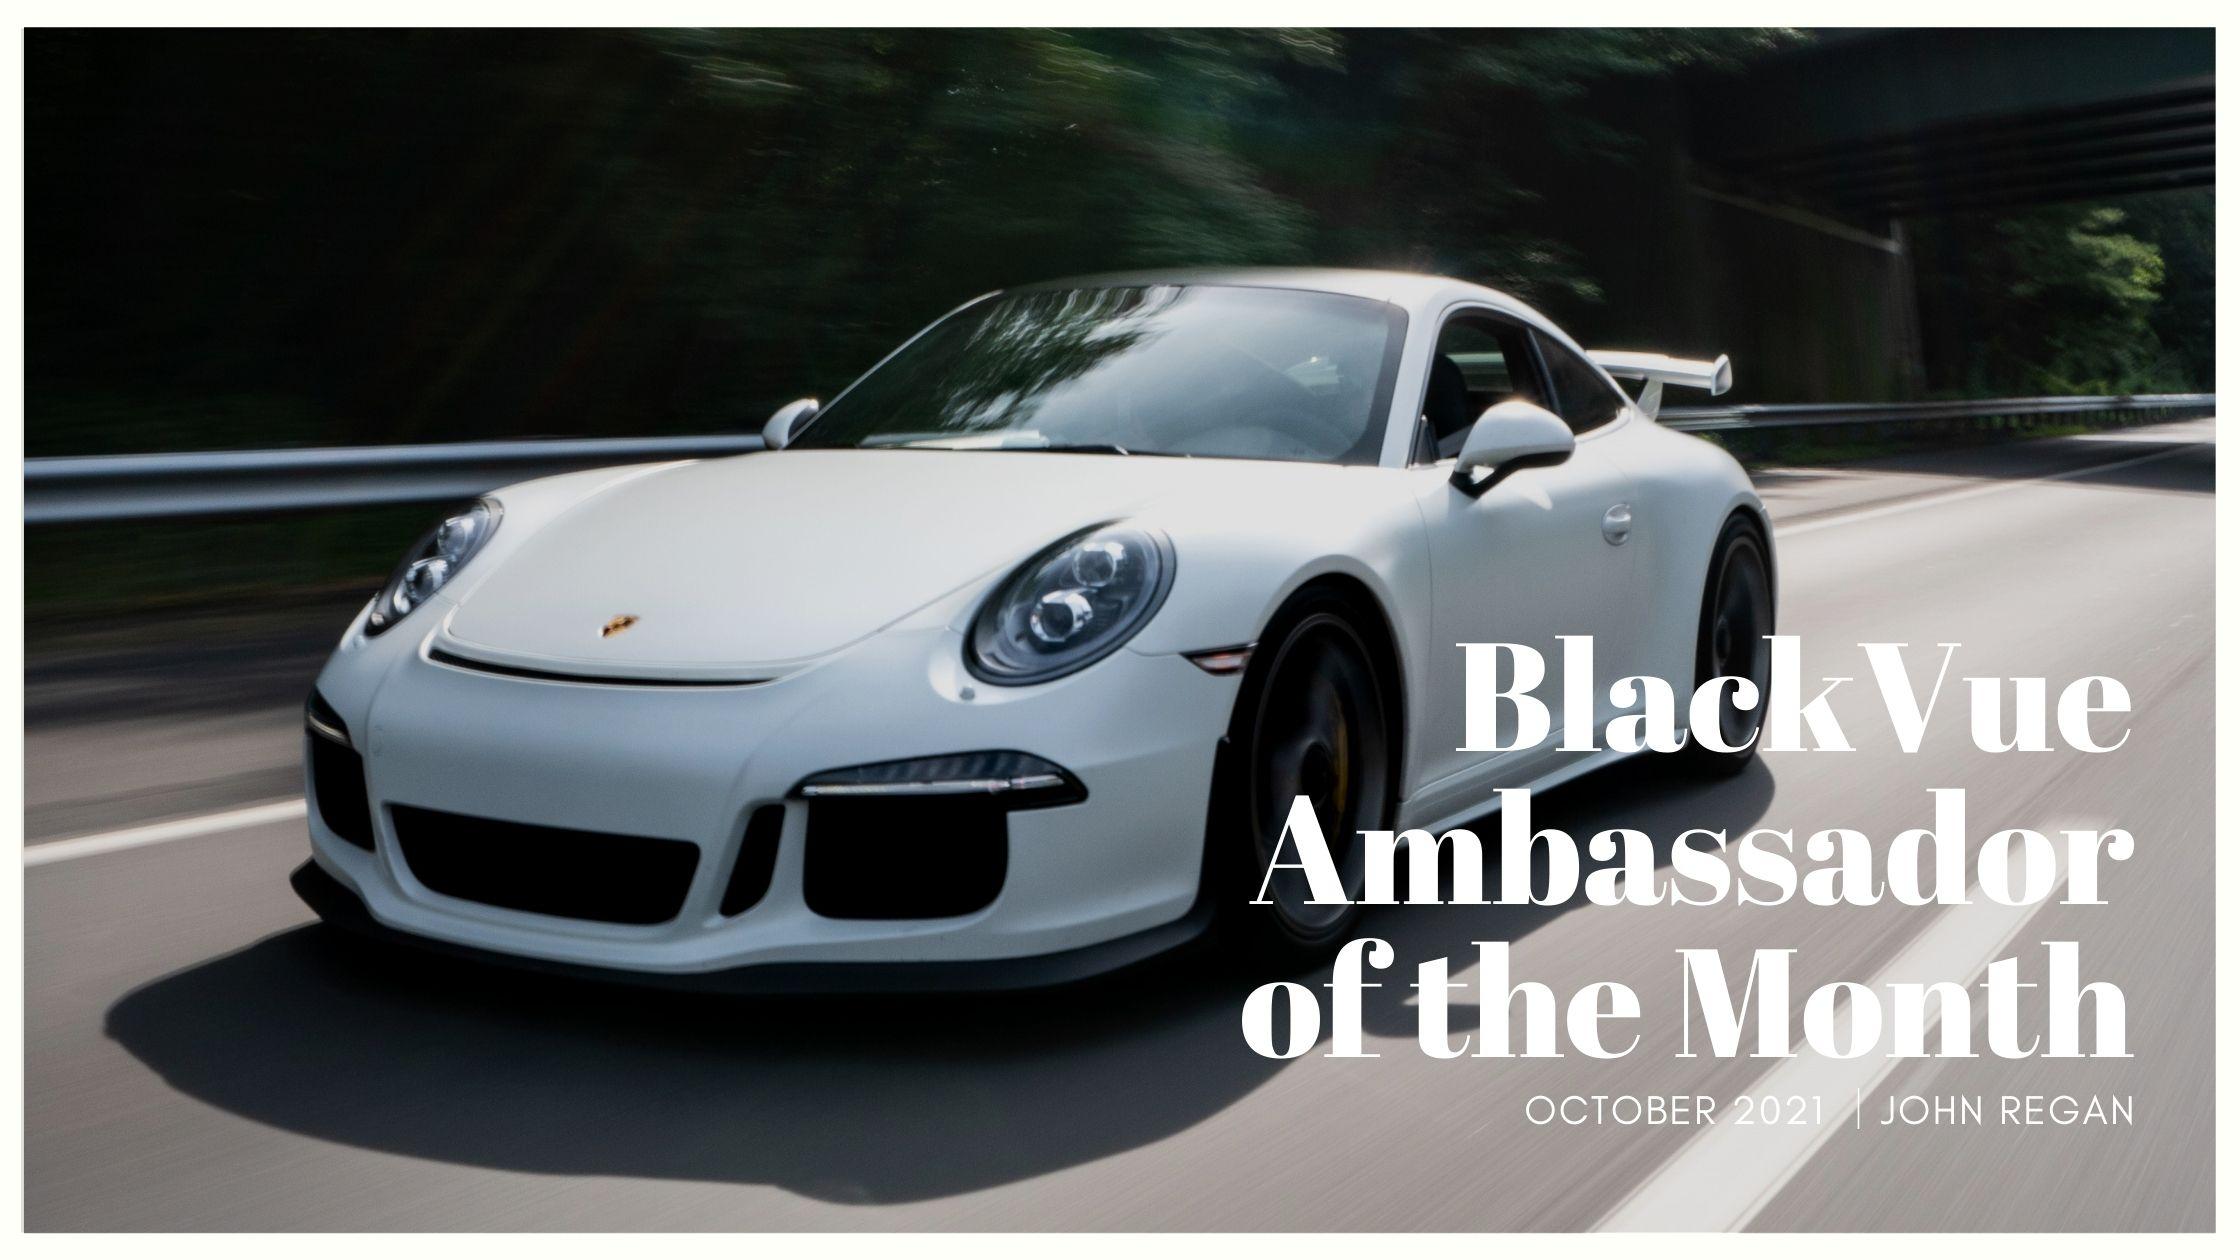 Ambassador of the Month – October 2021